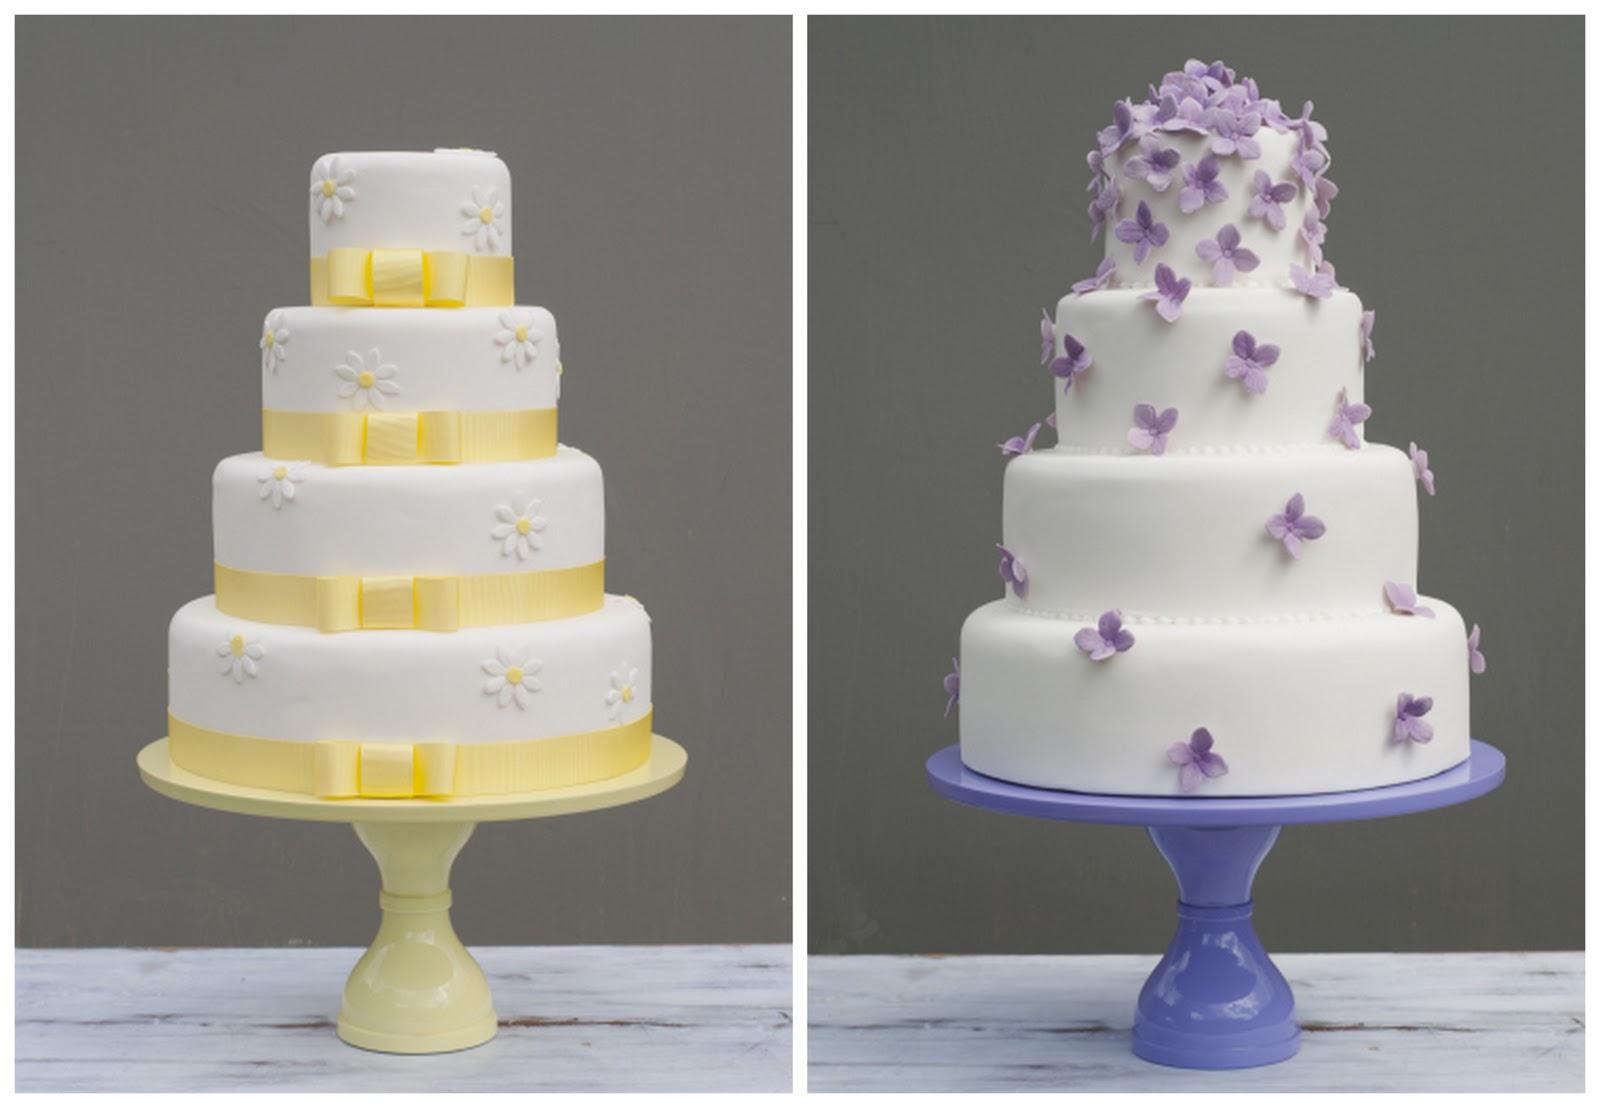 Cake Decorations For Wedding Cakes Uk : Edible Wedding Place Cards & Cakes